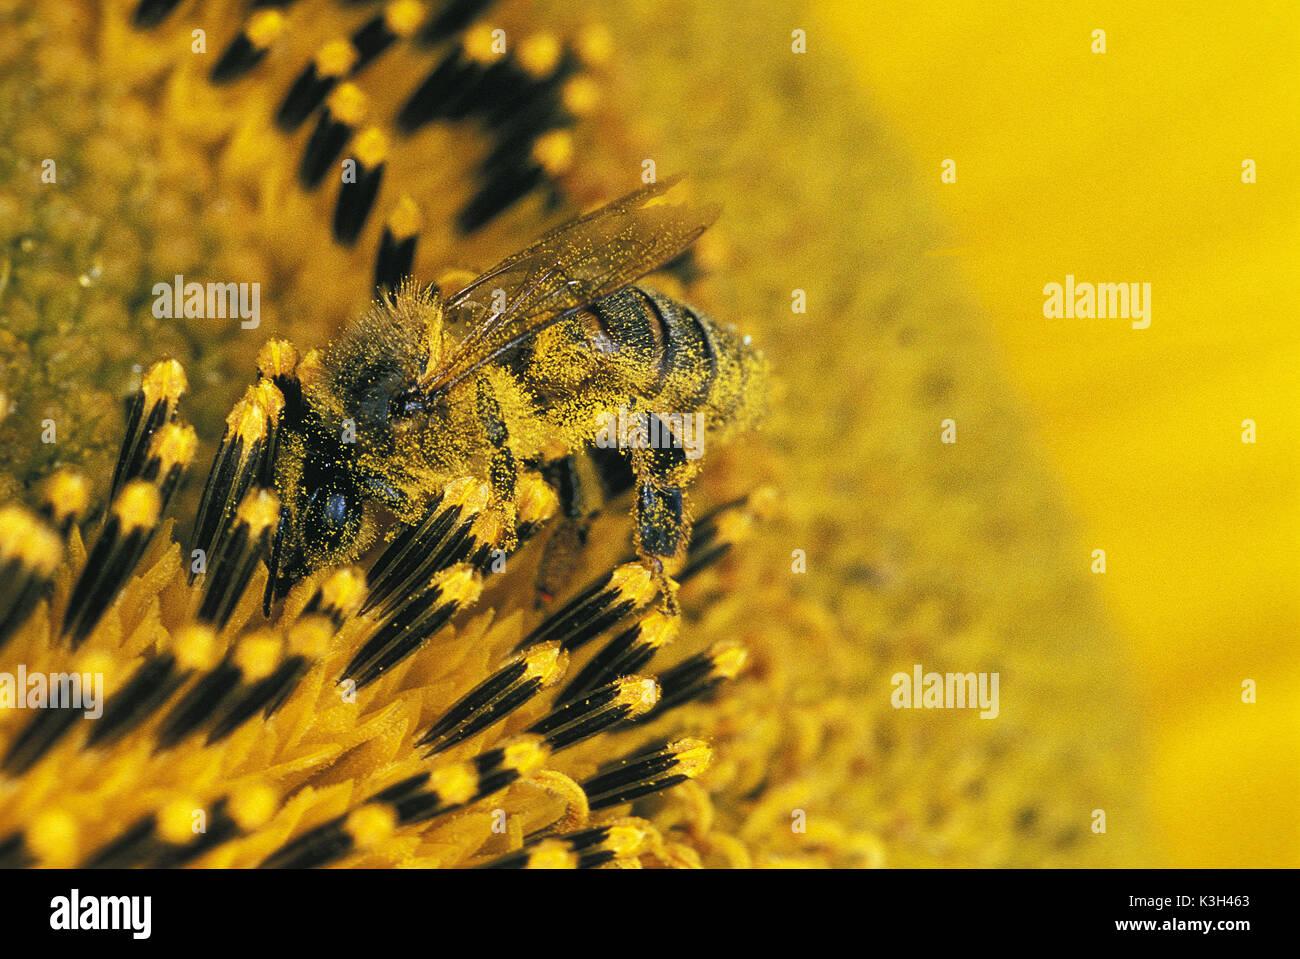 Abeja de miel, Apis mellifera, Adulto en el girasol, el polen sobre su cuerpo, close-up Foto de stock